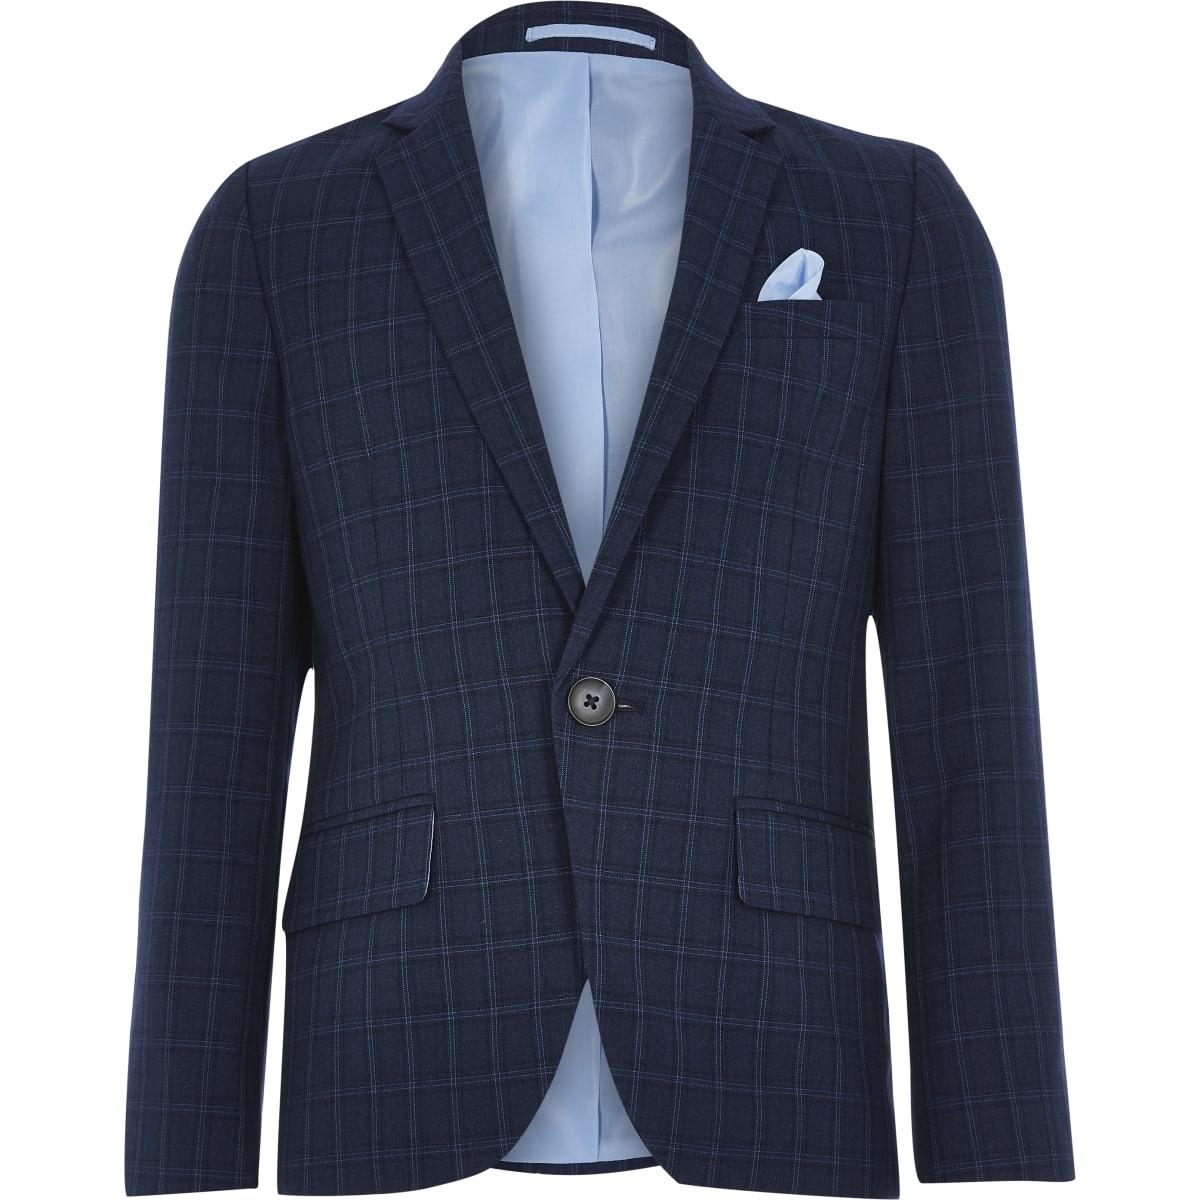 Boys navy check suit blazer